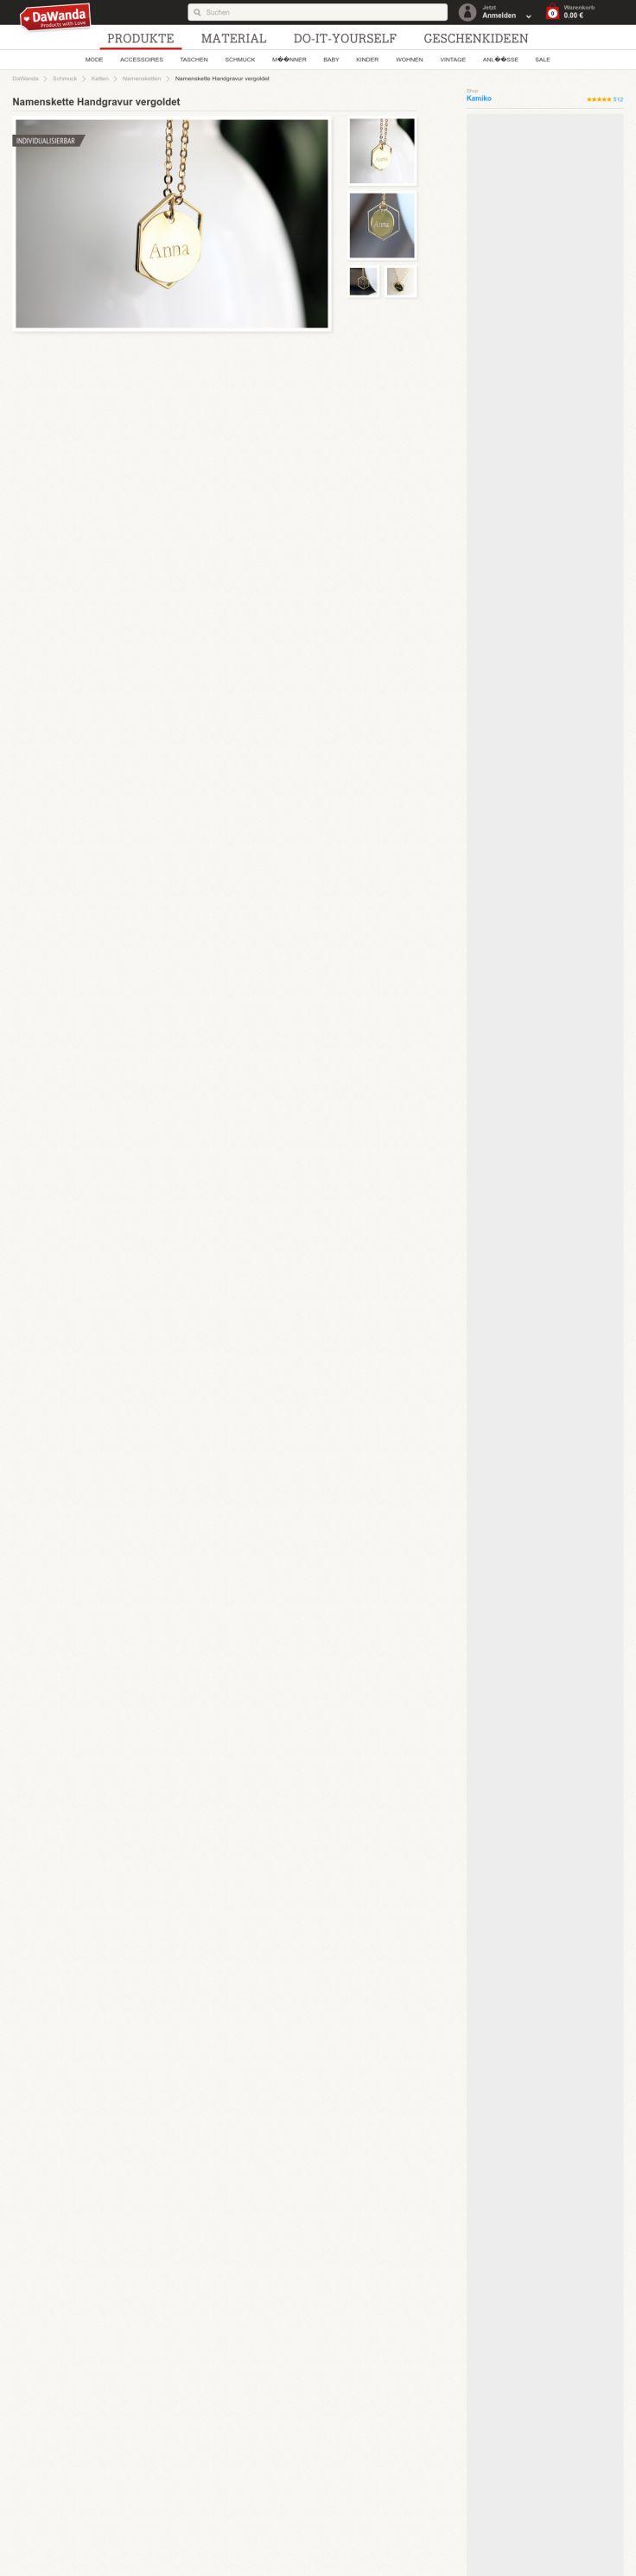 Website'http%3A%2F%2Fde.dawanda.com%2Fproduct%2F89858343-namenskette-handgravur-vergoldet' snapped on Page2images!